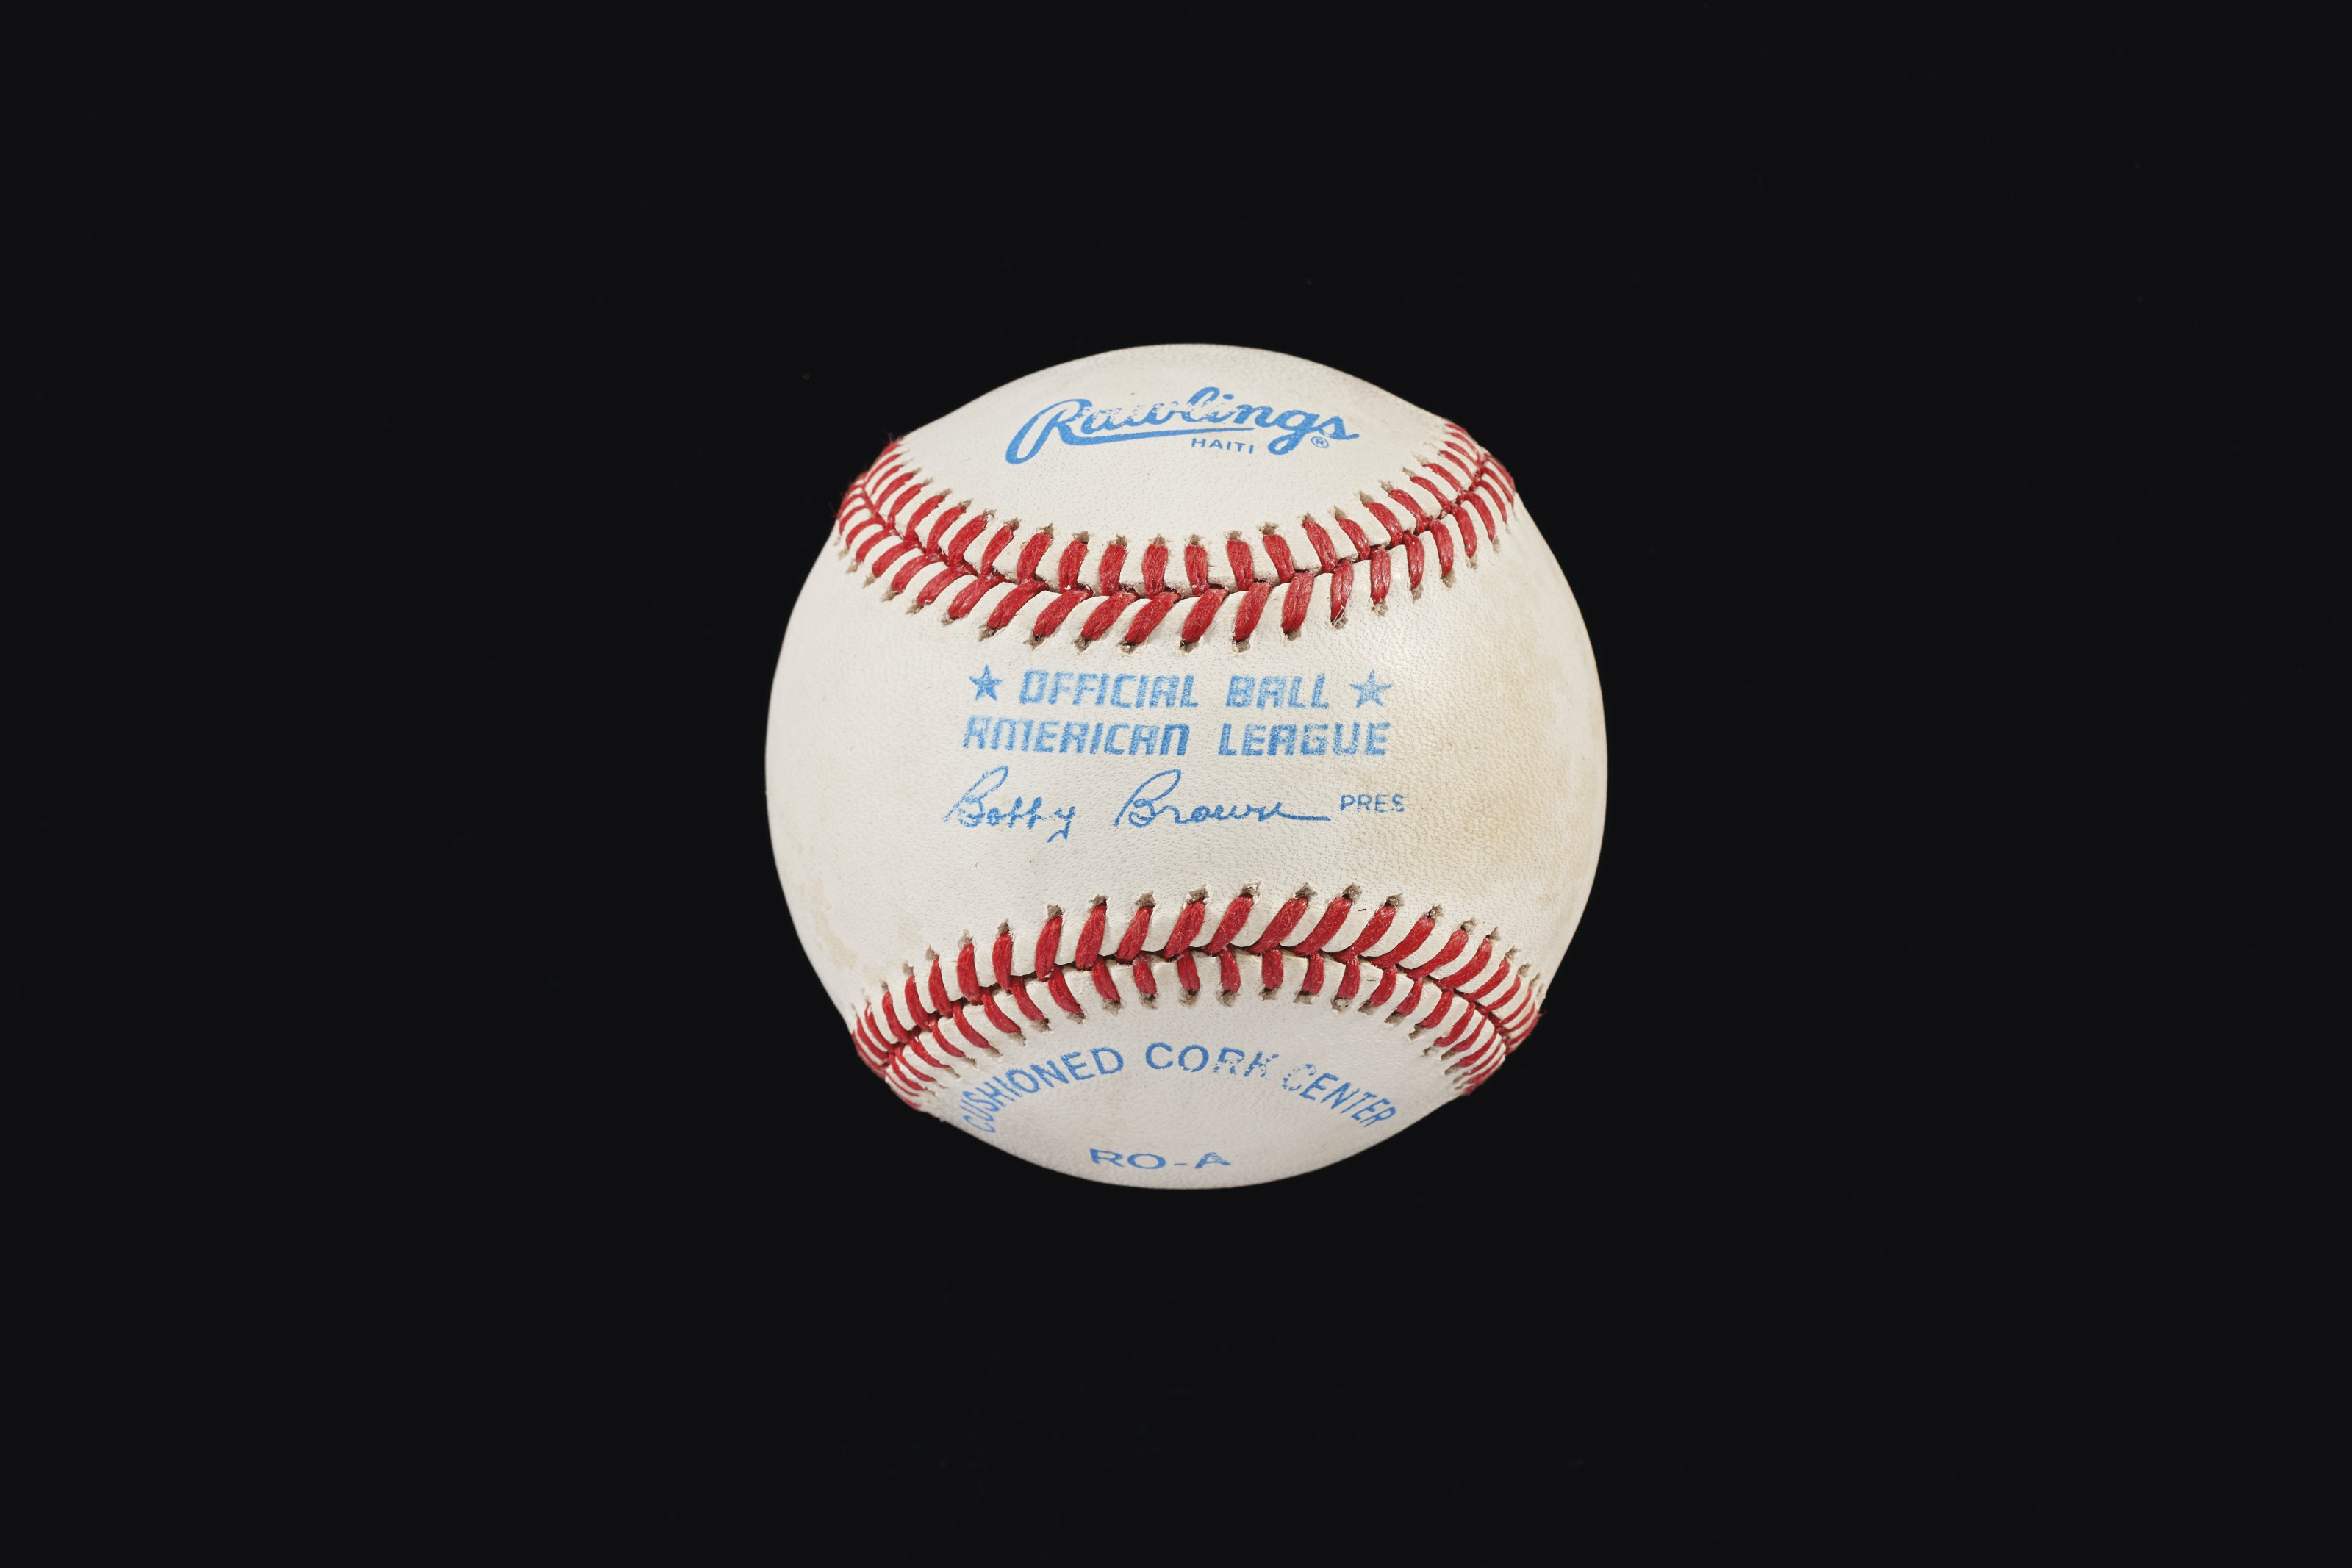 President Ronald Reagan Single Signed Baseball (US President 1981-89)